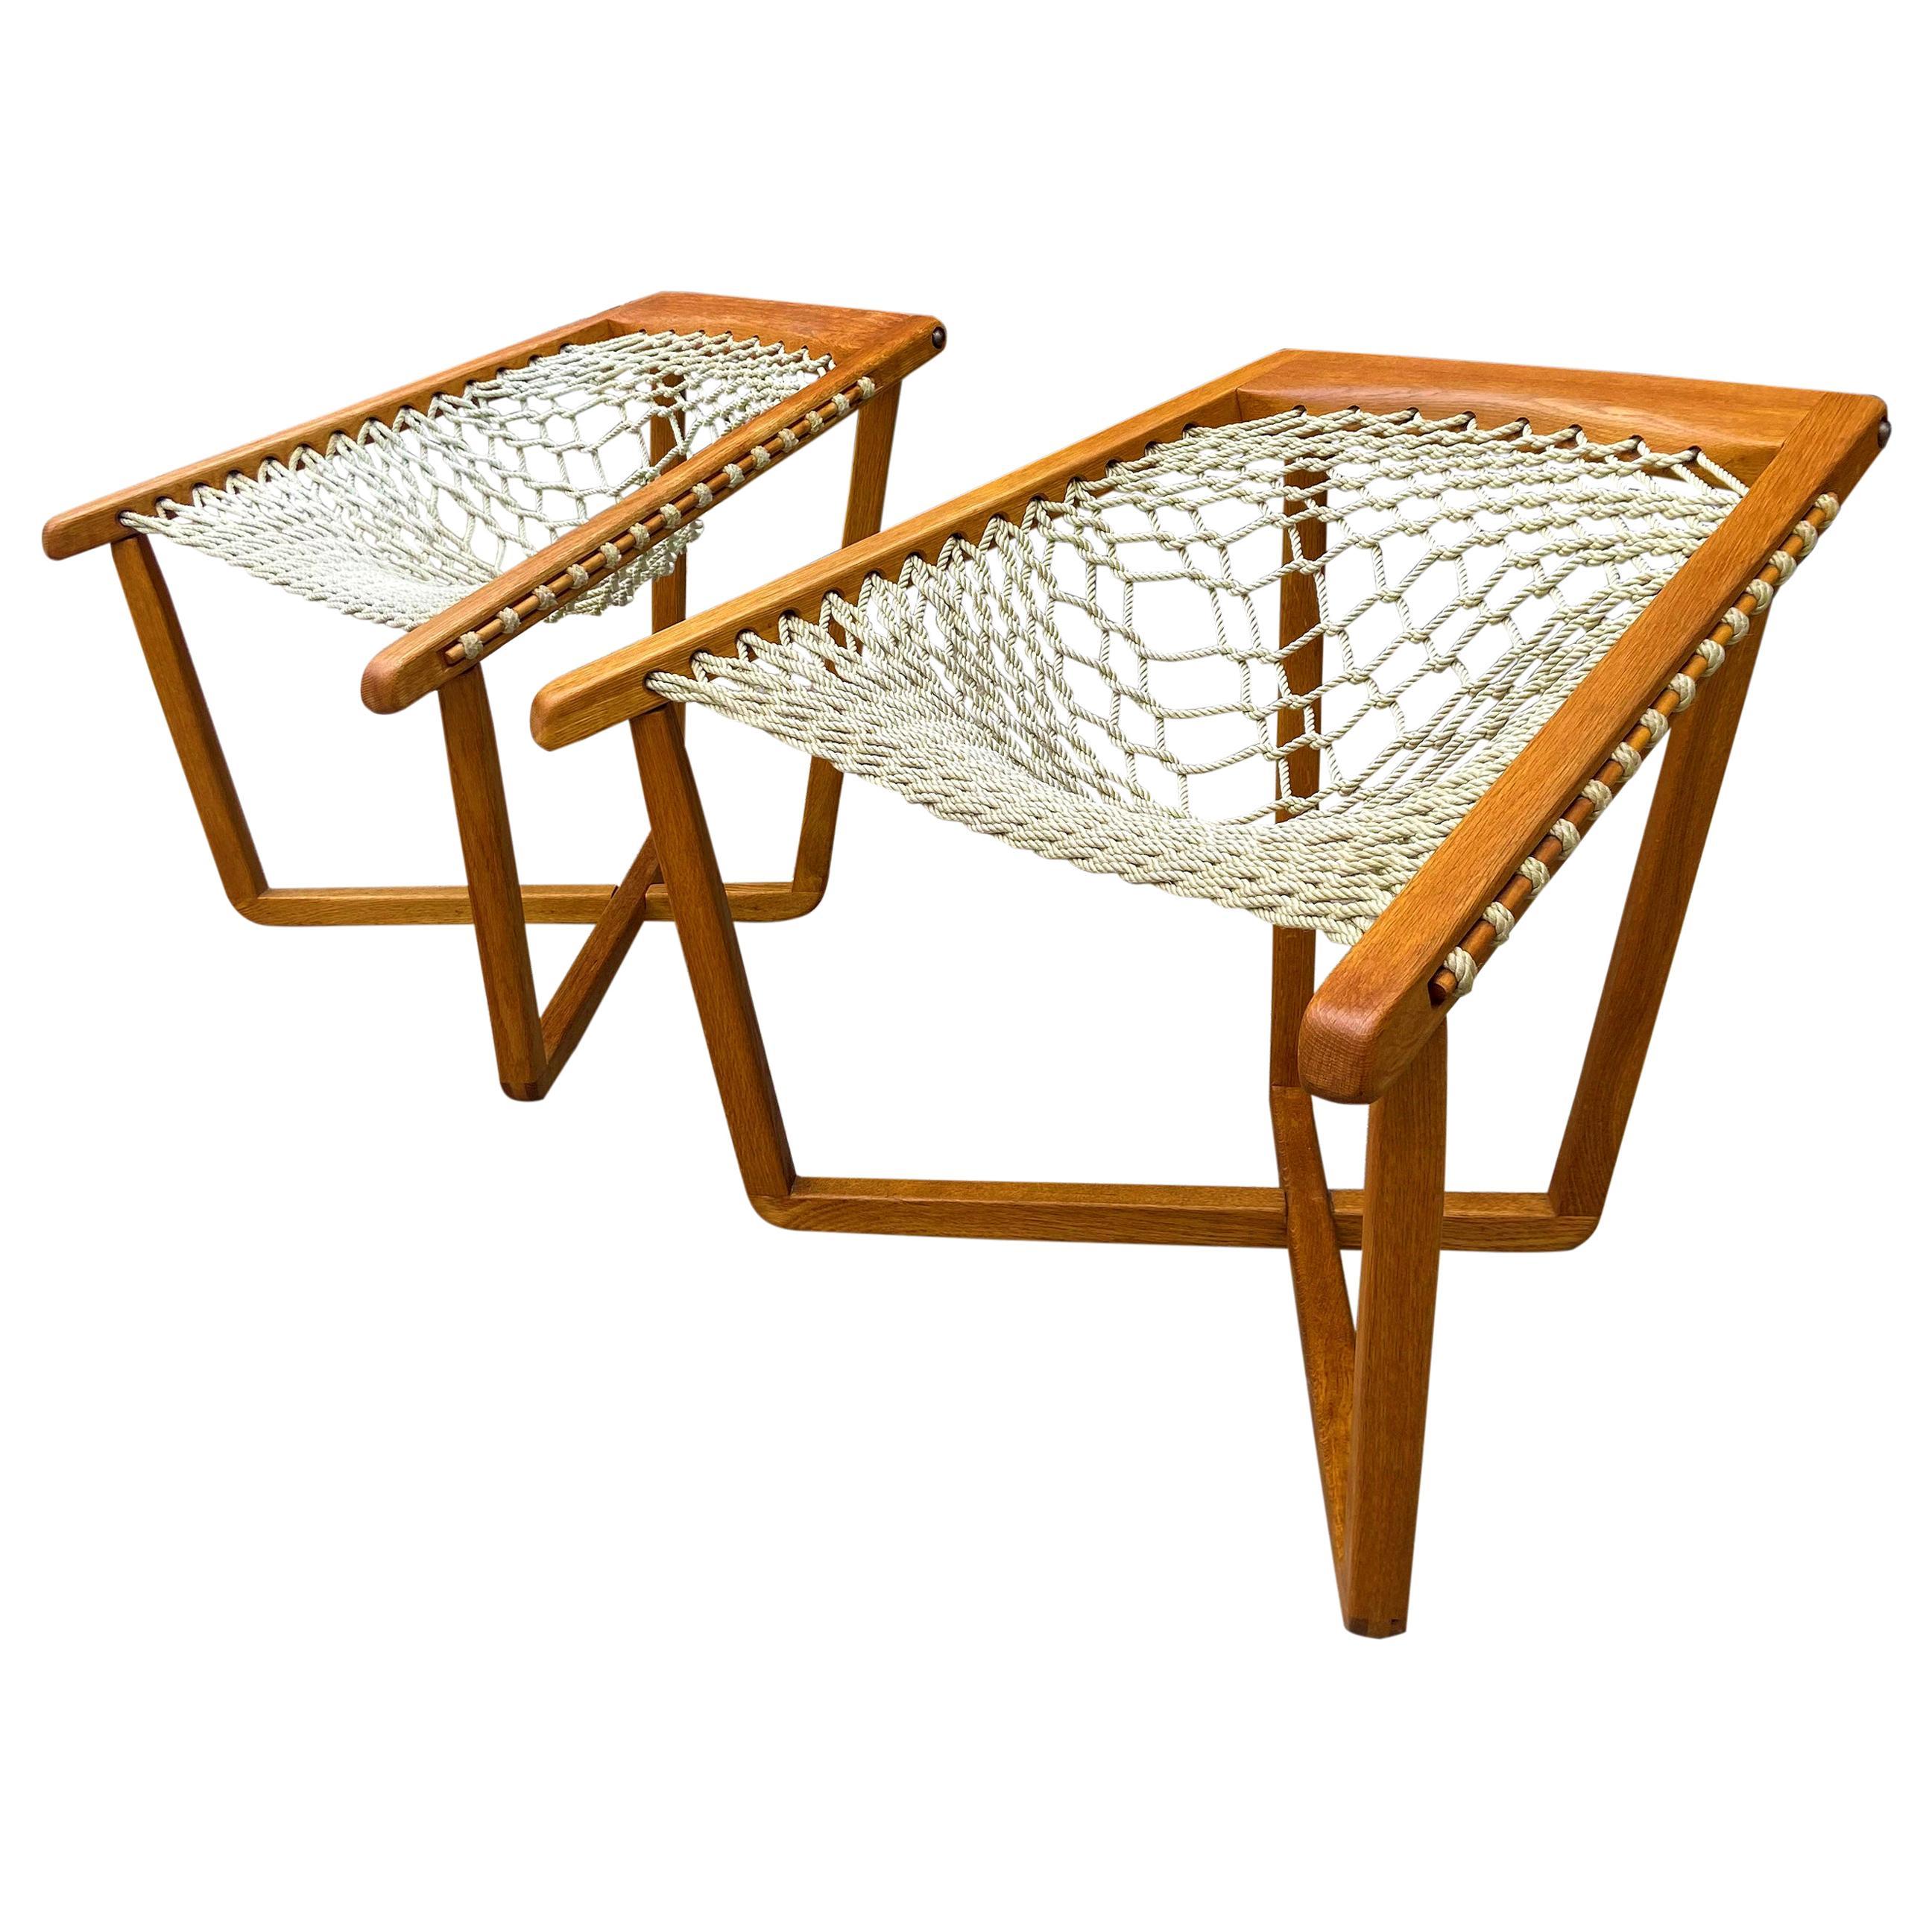 Midcentury Sling Chair Hammock Design